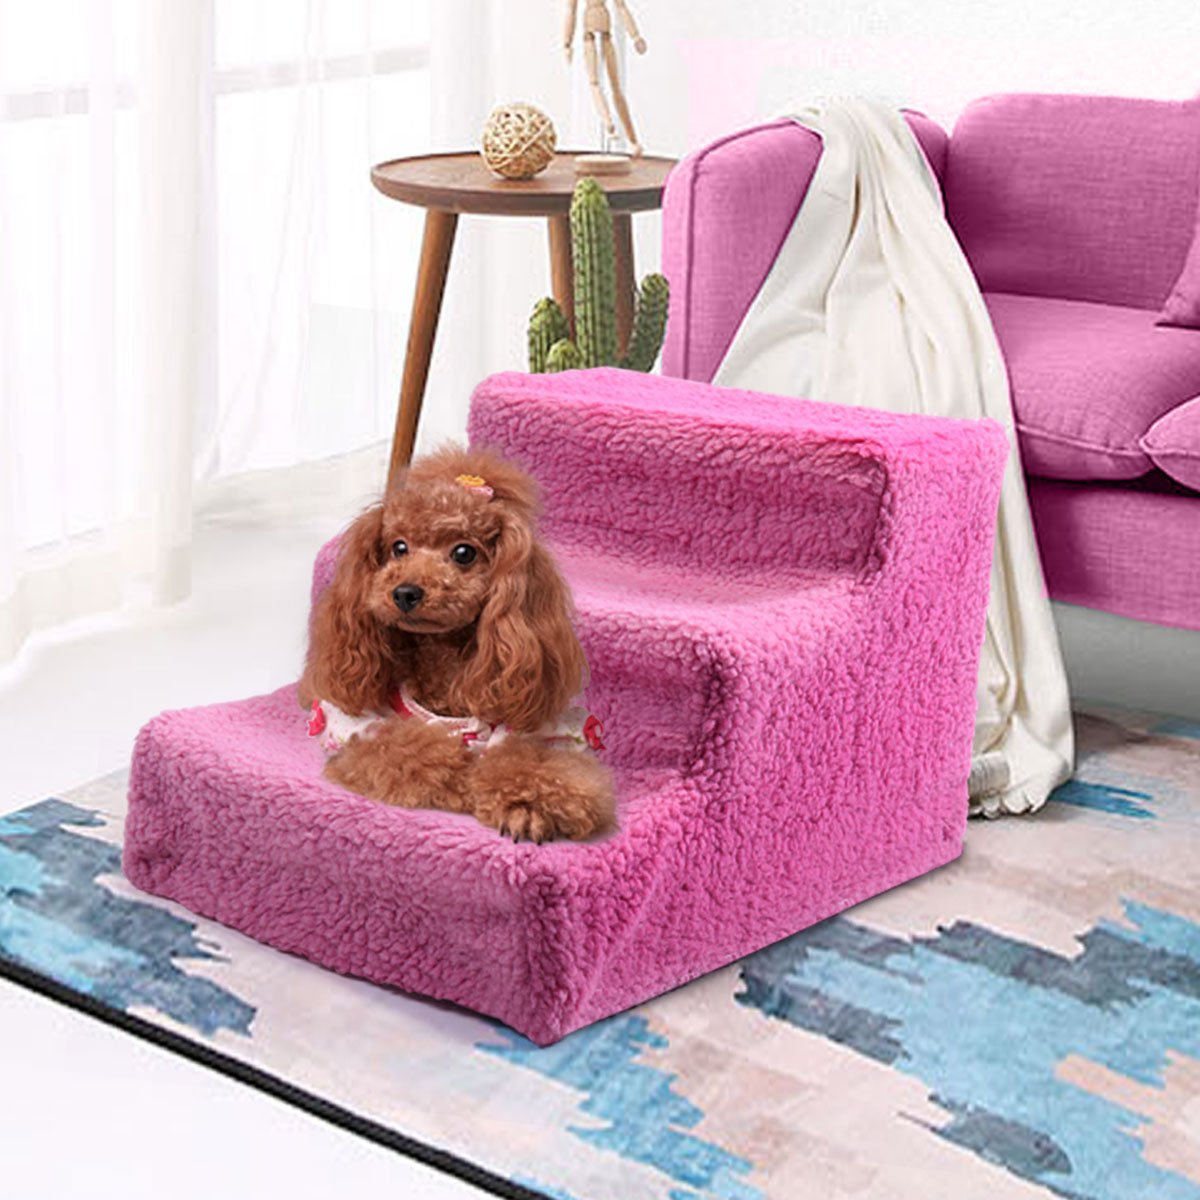 Tobbi Pet Stairs 3 Steps Indoor Dog Cat Steps Removable Washable Pets Ramp Ladder Pink by Tobbi (Image #5)